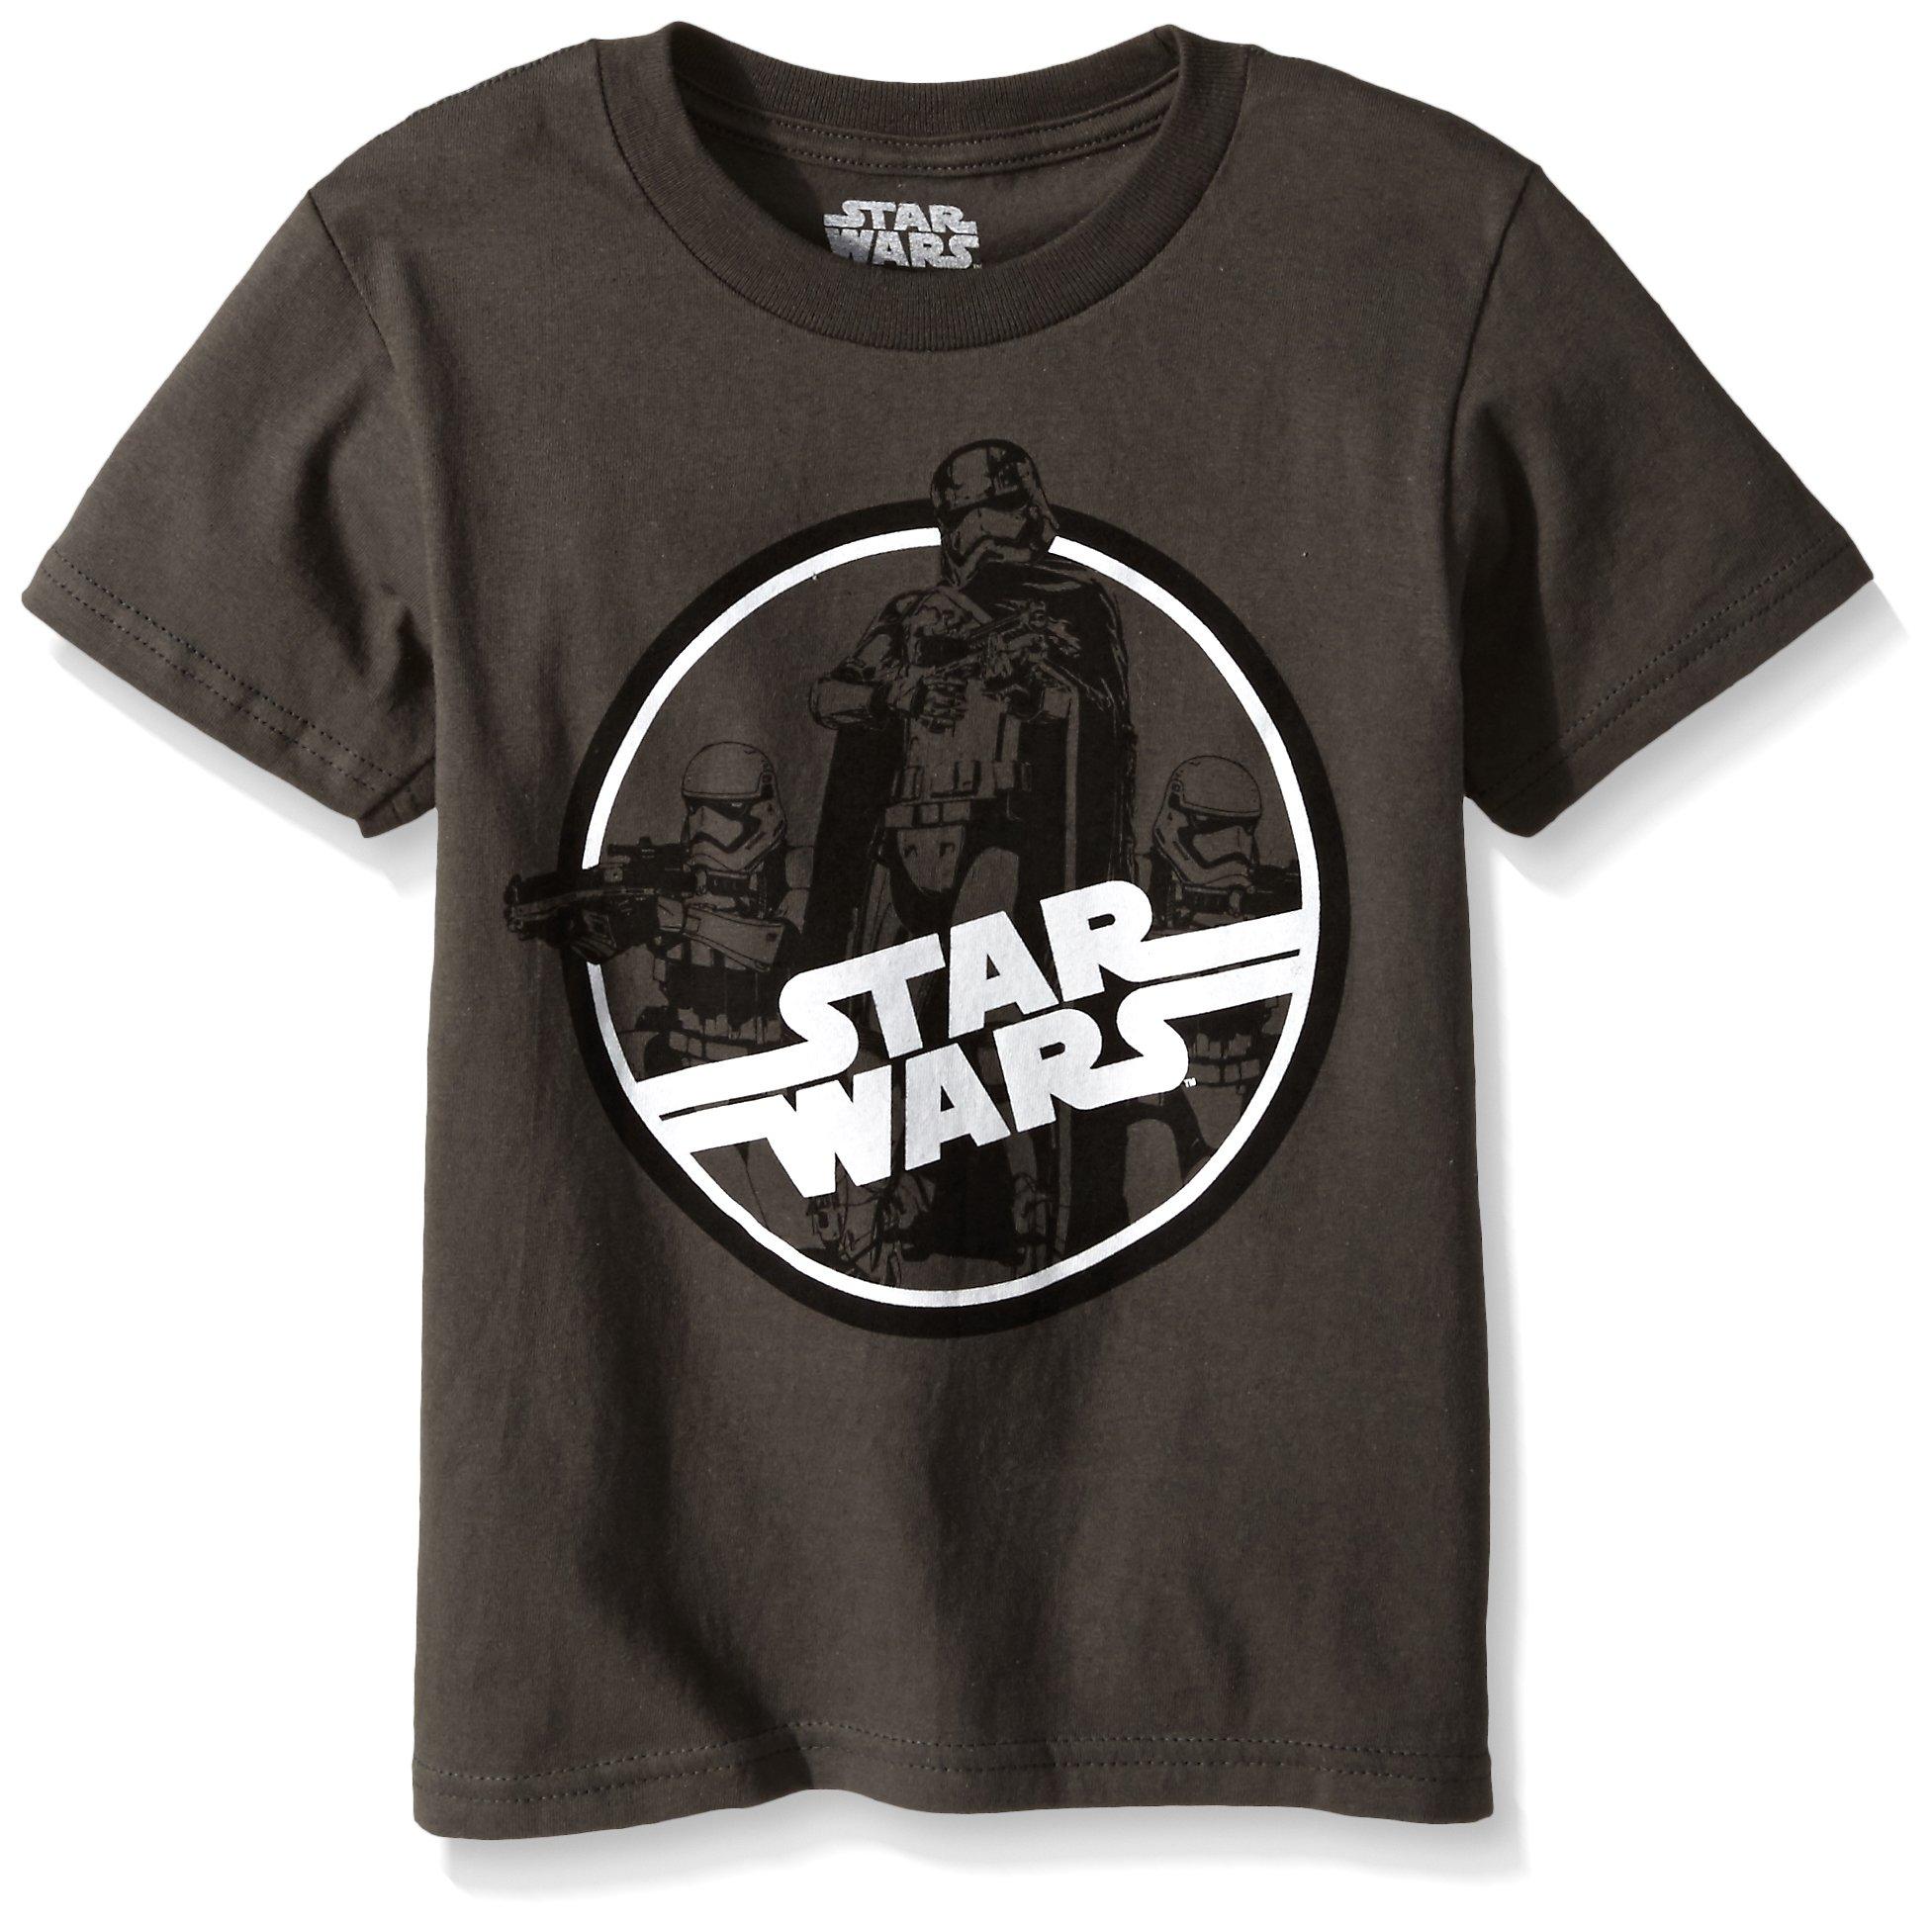 Star Wars Little Boys' T-Shirt, Logo Charcoal, 4